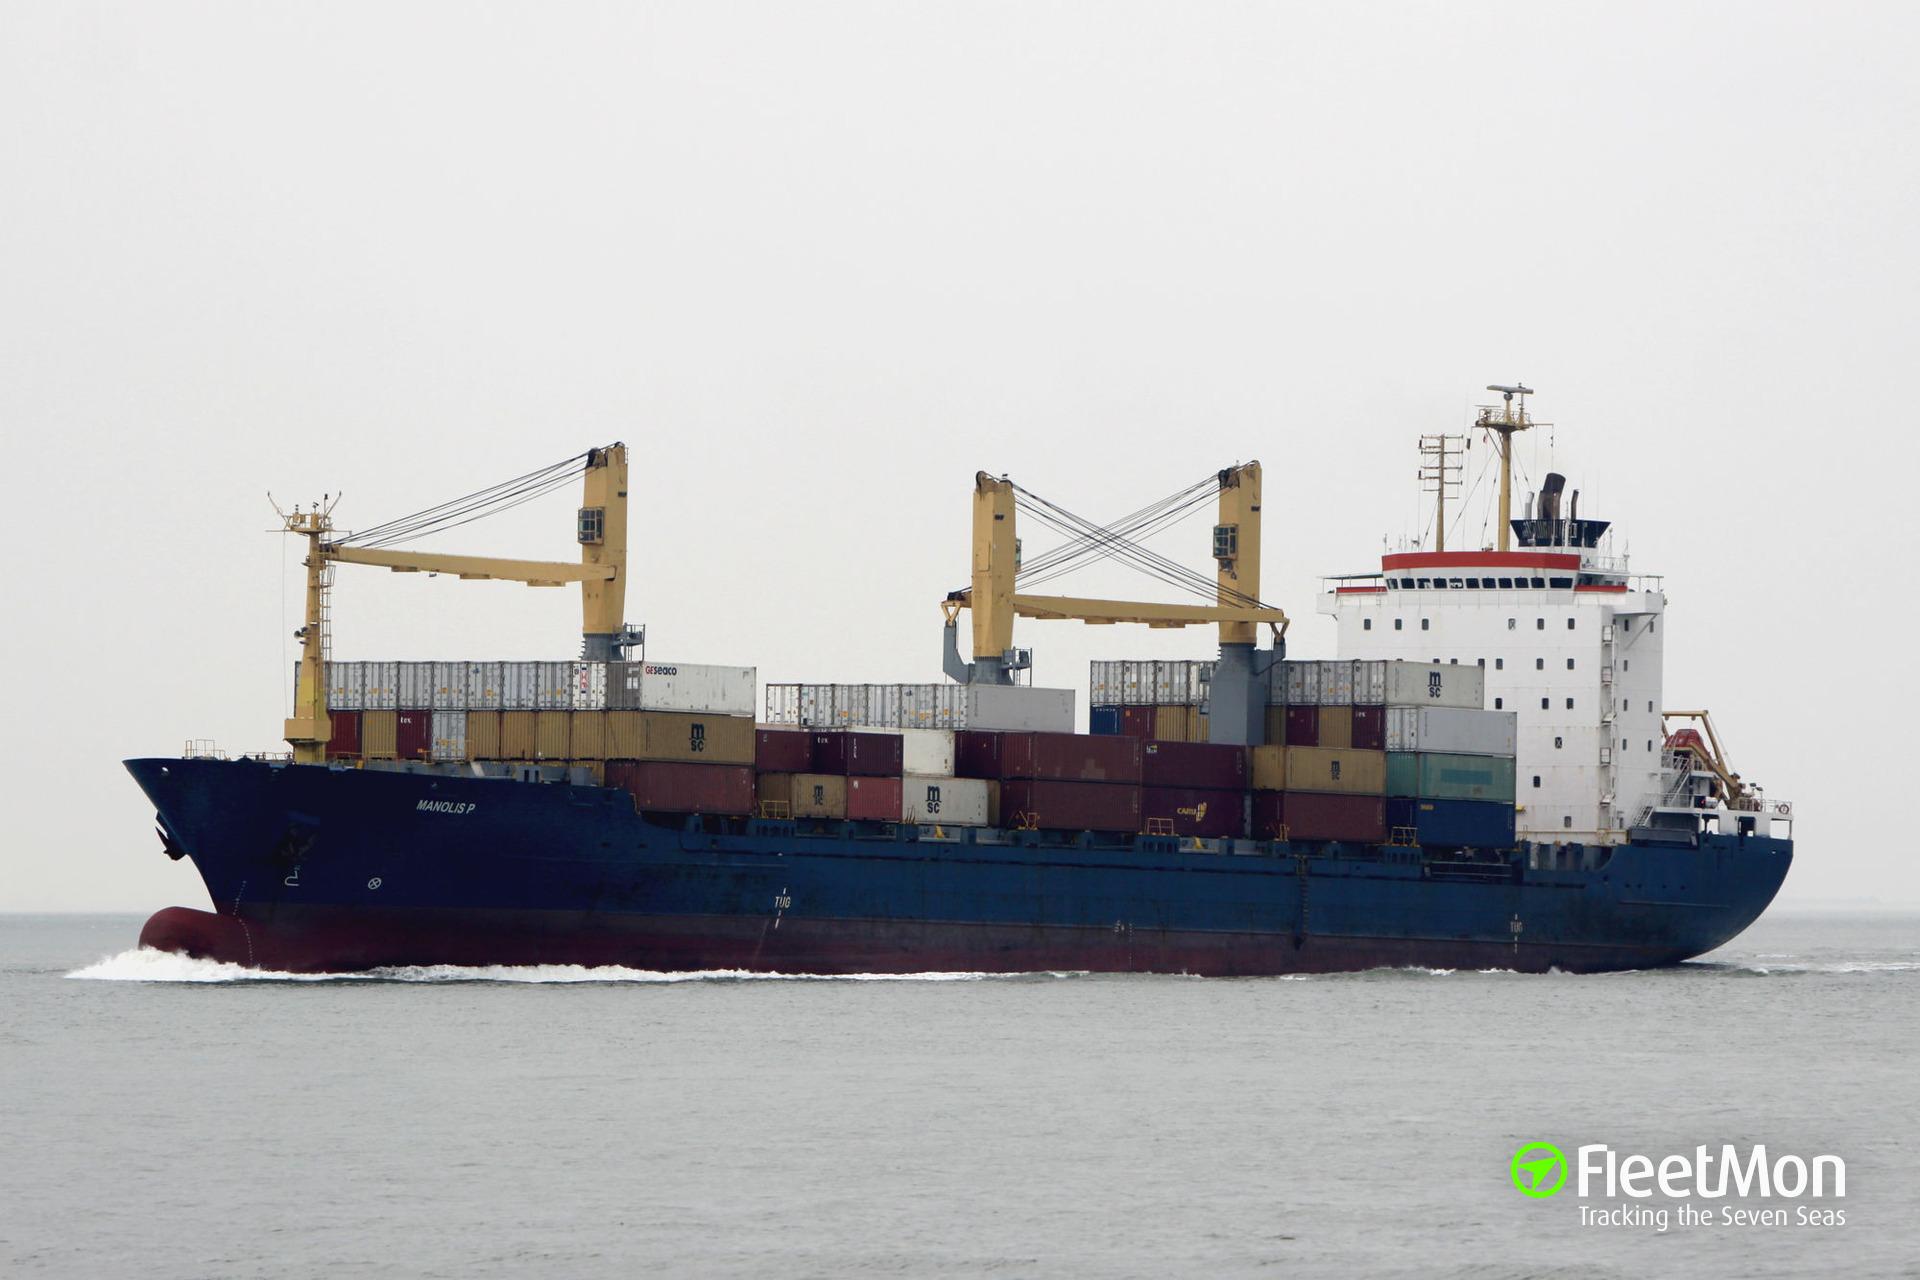 Boxship Manolis P in trouble in Bosphorus, Istanbul